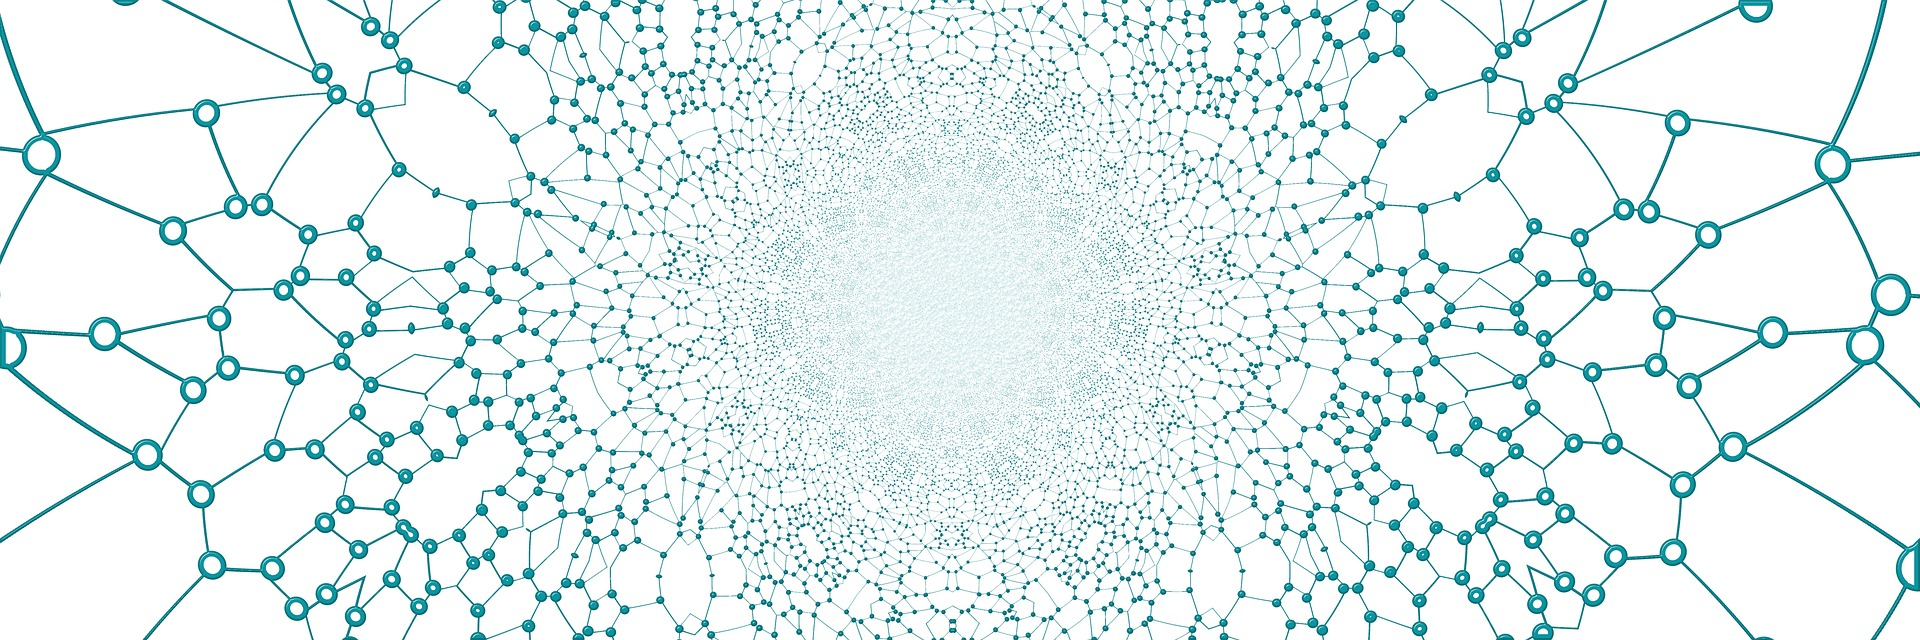 network-3849206_1920